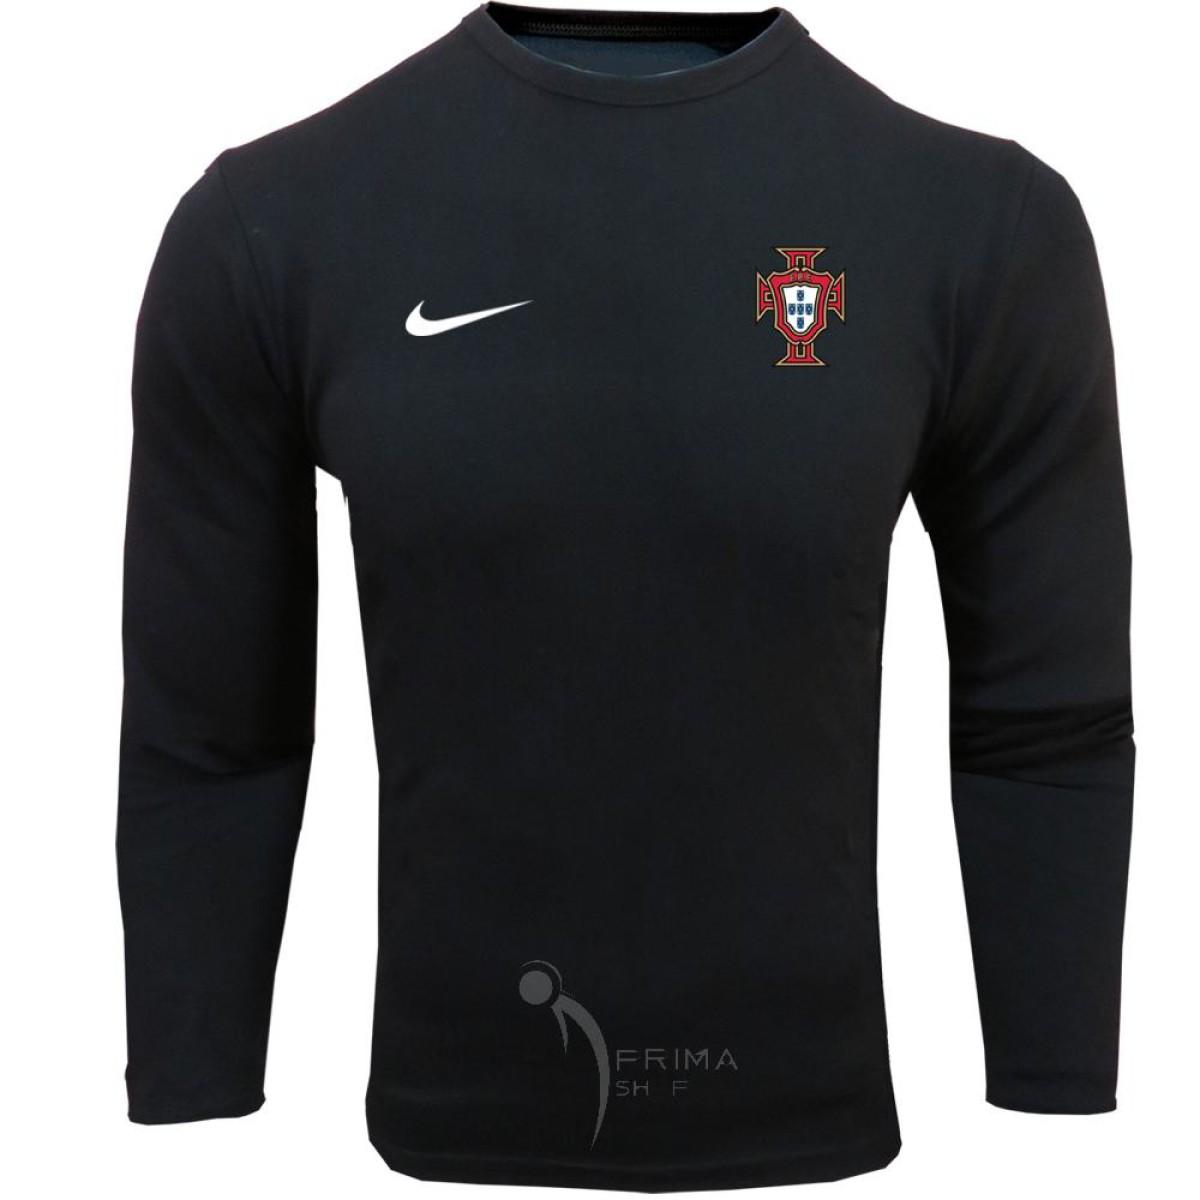 لباس هواداری پرتغال مشکی | تیشرت آستین بلند